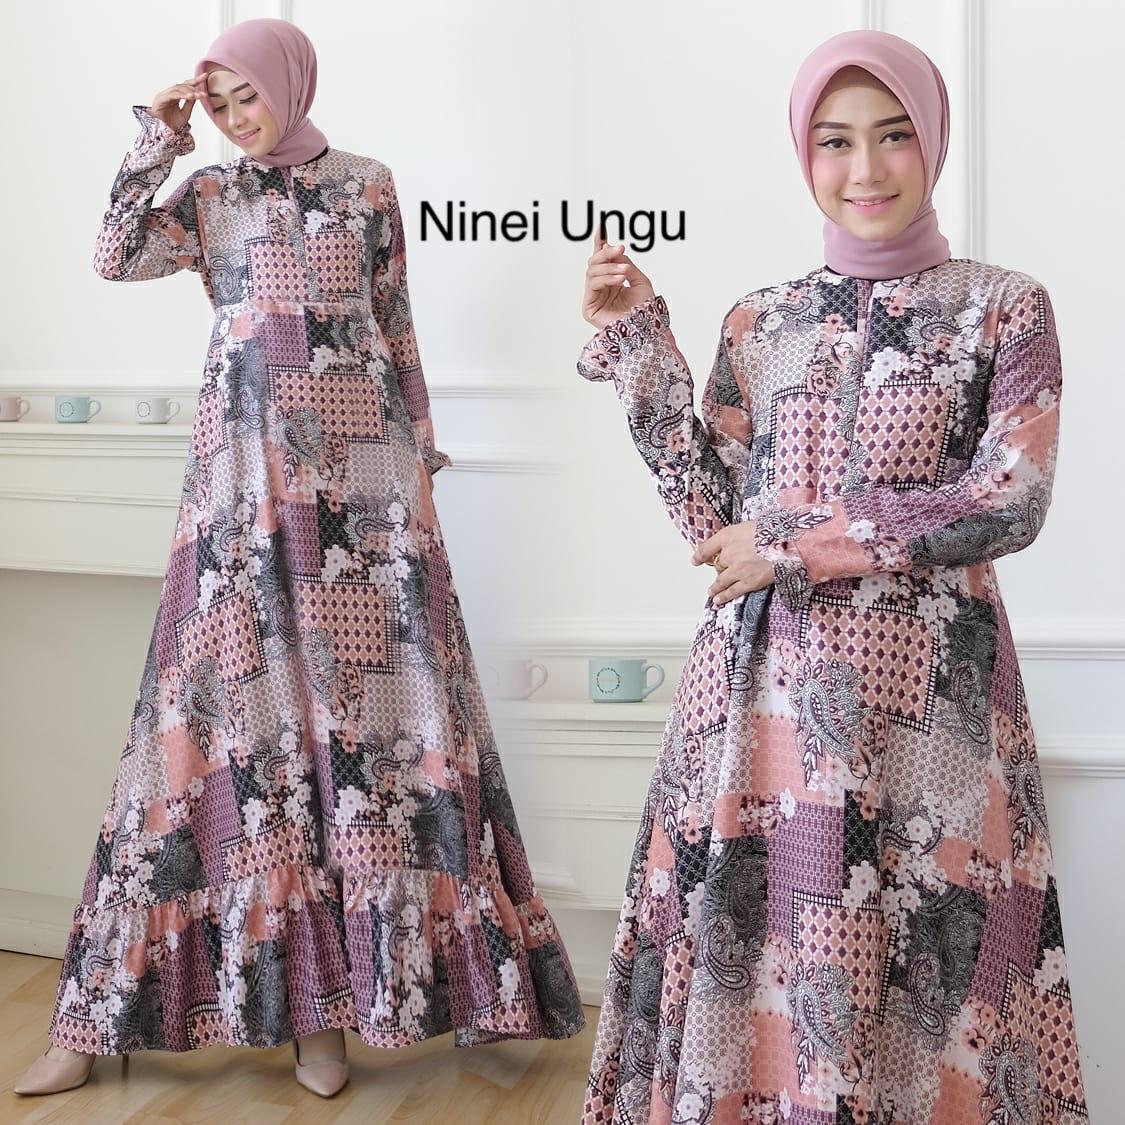 qwfashion1-cod-ns-bju gamis wanita  2020 / bju gamis remaja wanita / jubah wanita  2020 / baju muslim wanita  2020